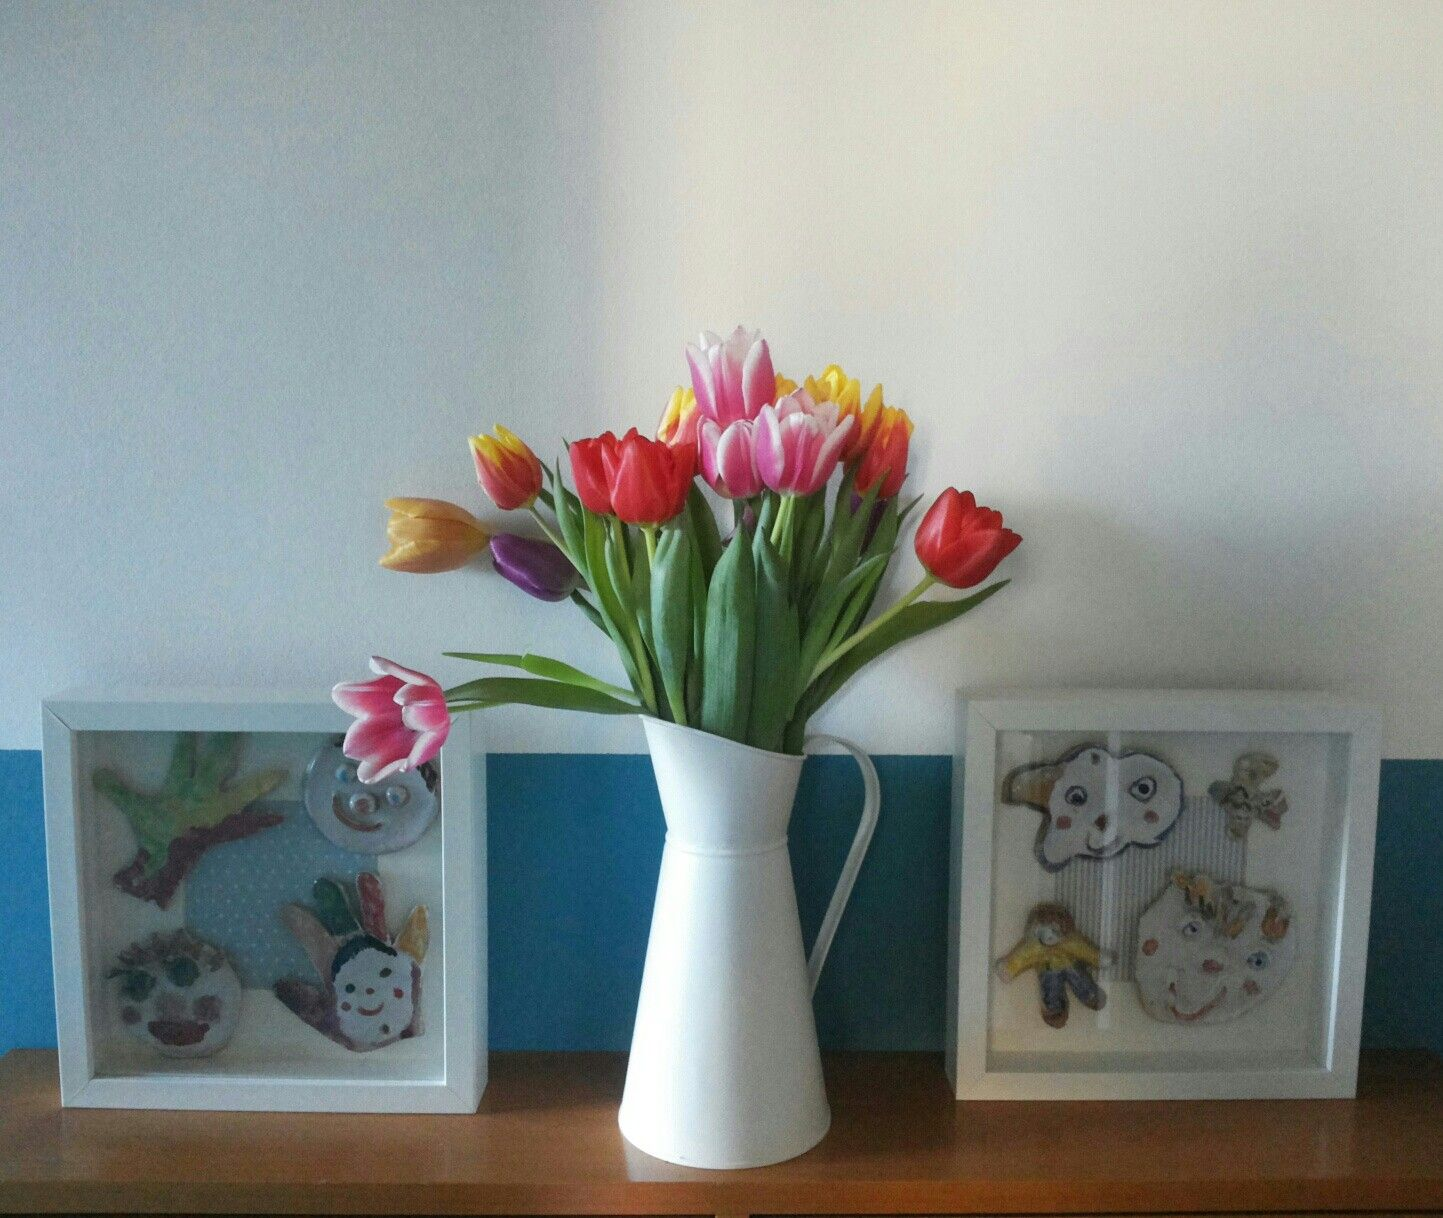 Tulips, home decor